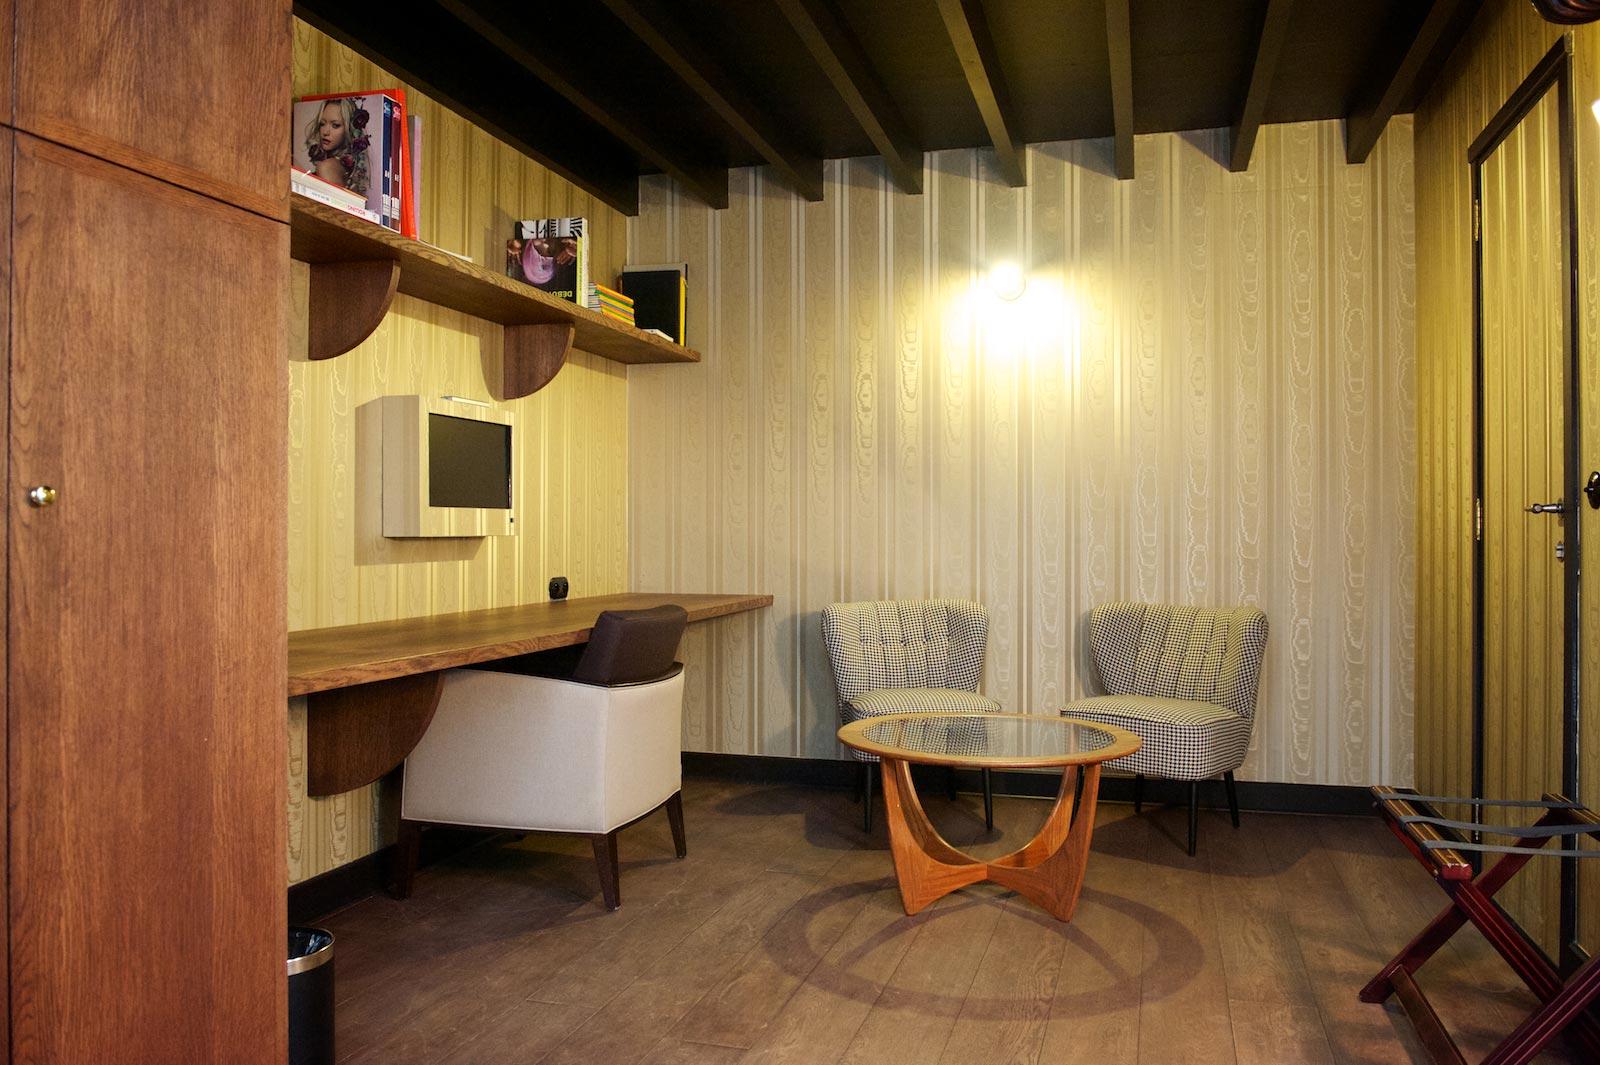 hotel-le-berger-rooms-comfort-mezzanine-eulalie-003-01.jpg